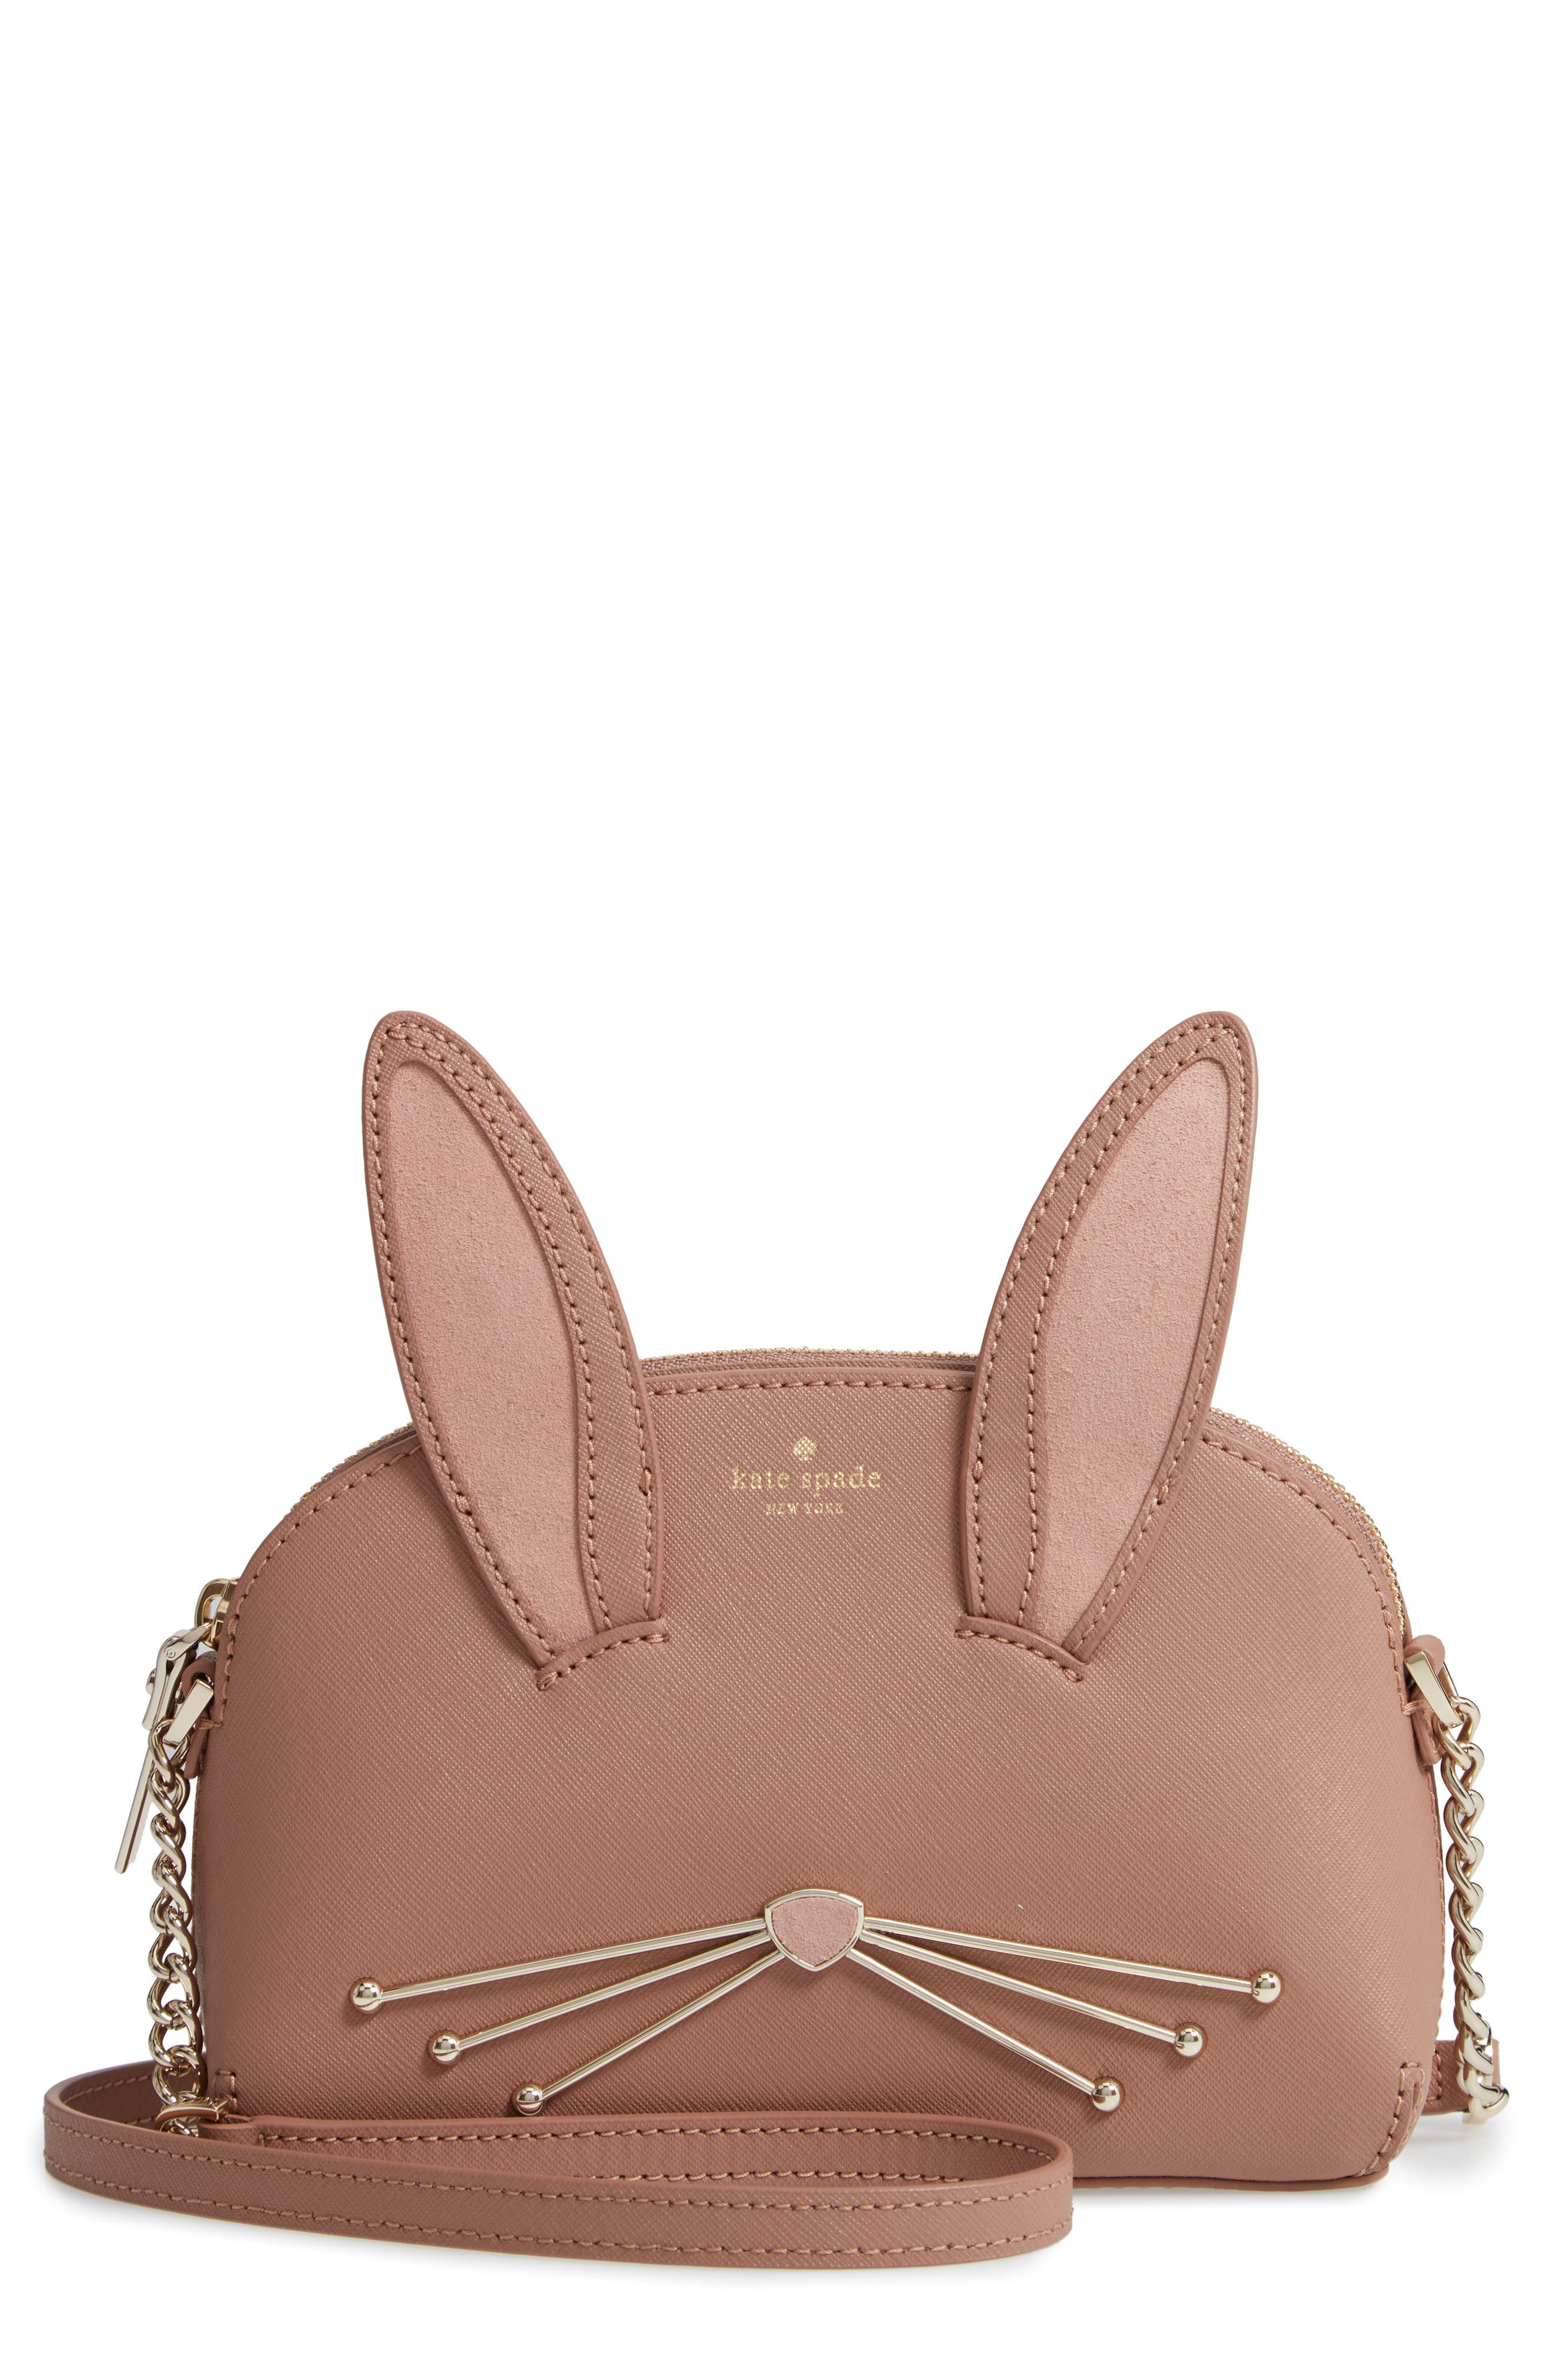 KATE SPADE NEW YORK desert muse rabbit hilli bag, Main, color, 200